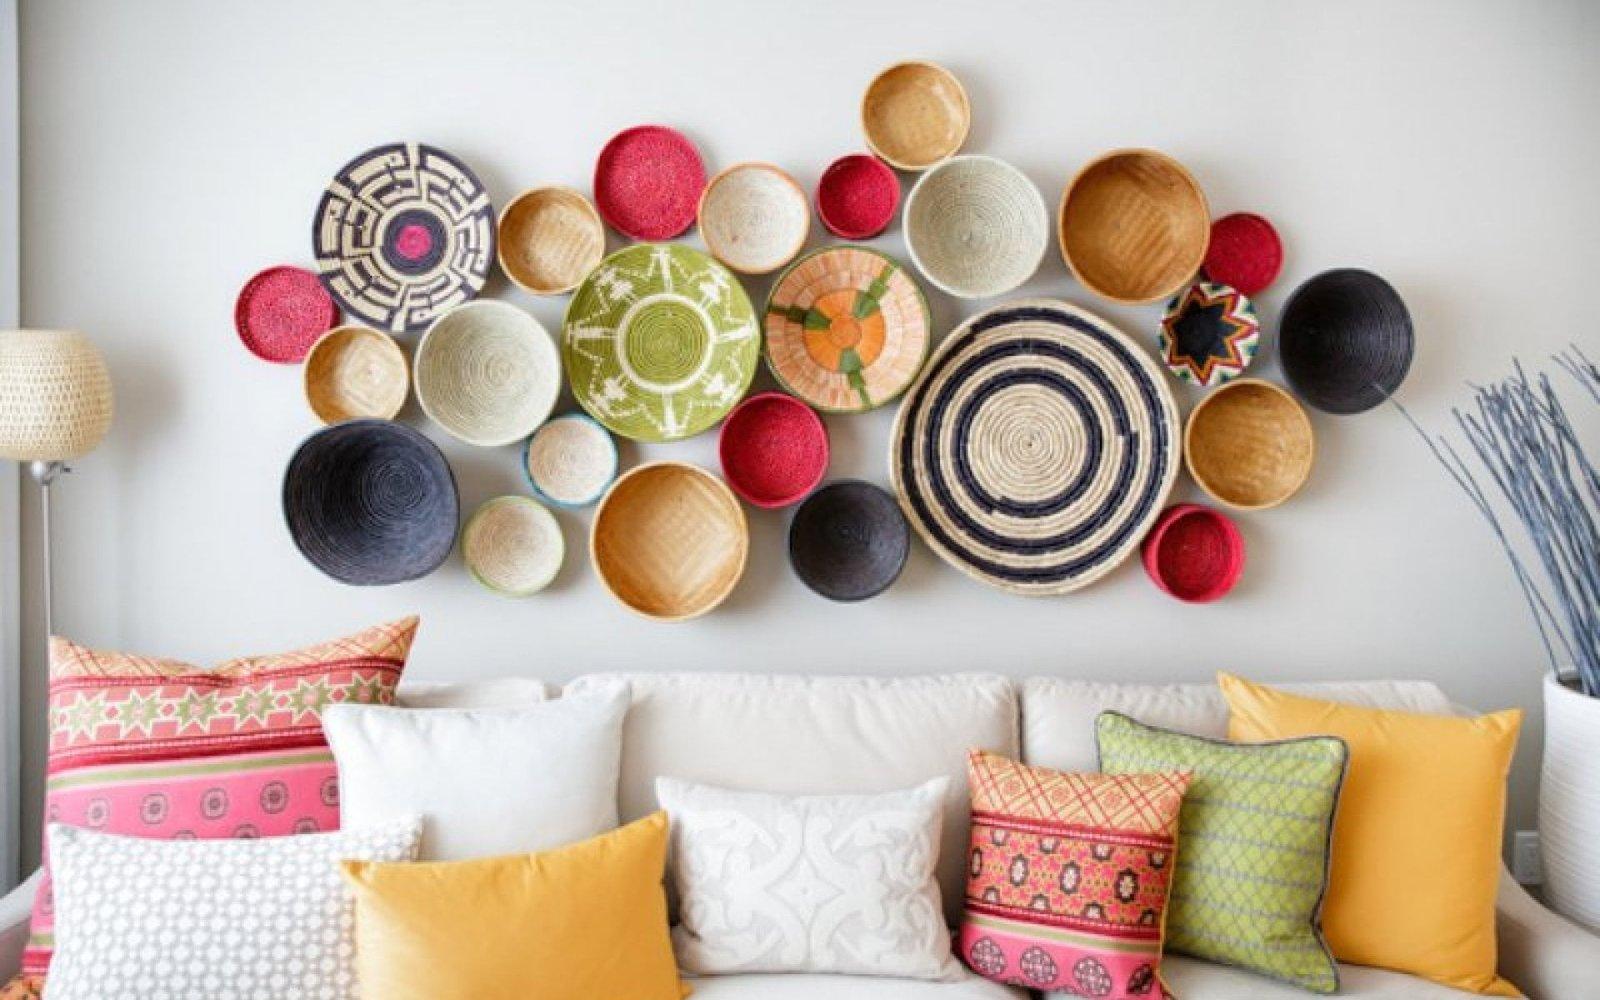 Stylish DIY Ideas To Stay Organize